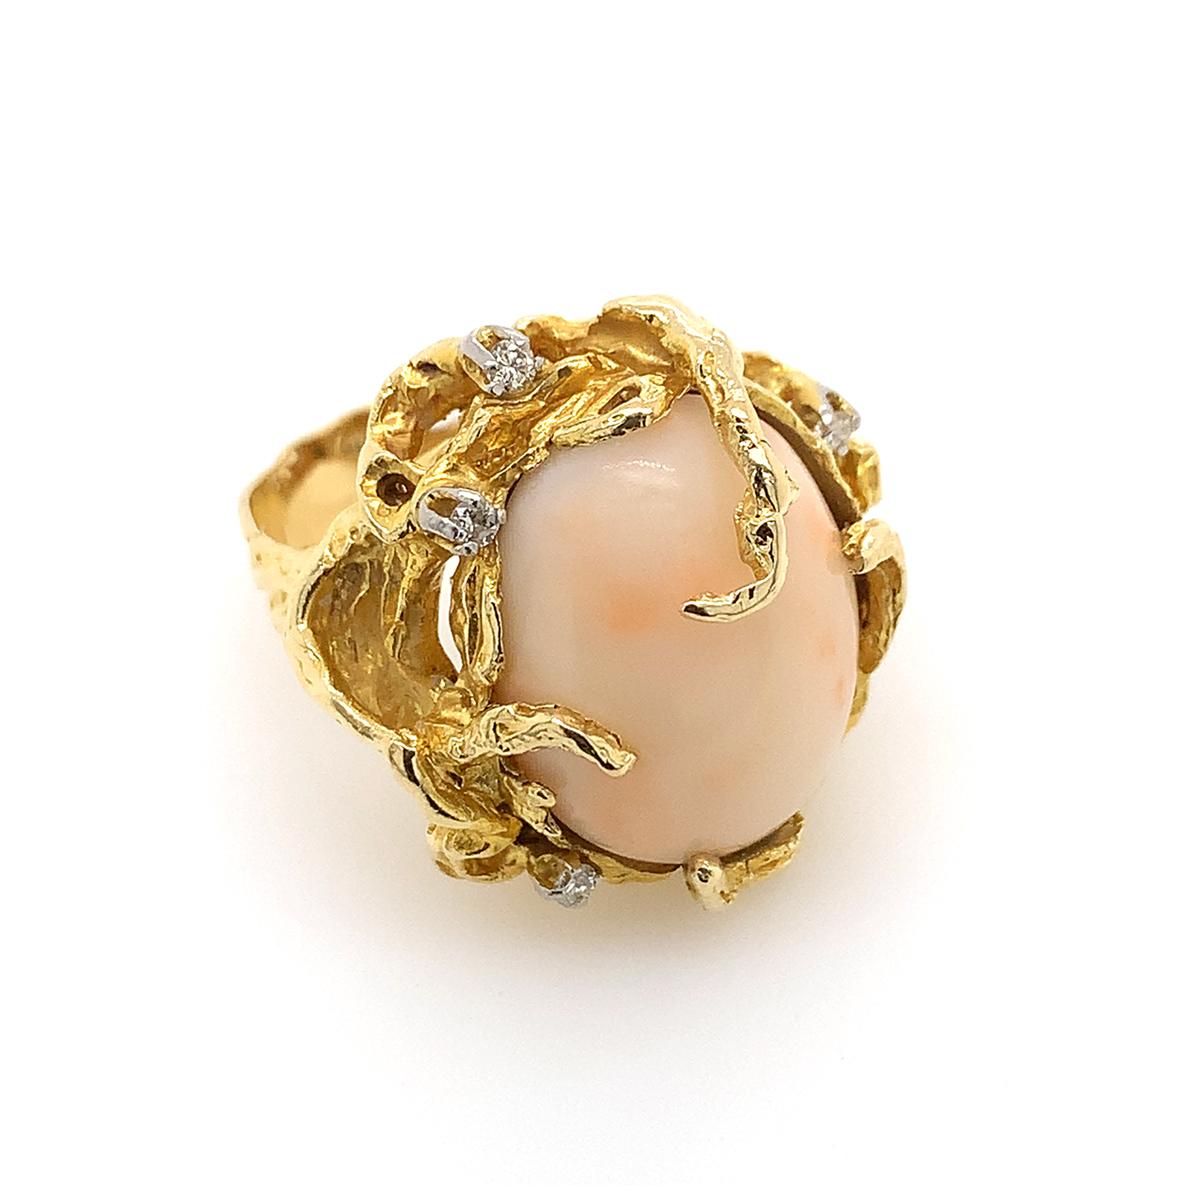 Vintage 14 Karat Yellow Gold Angel Skin Coral and Diamond Ring